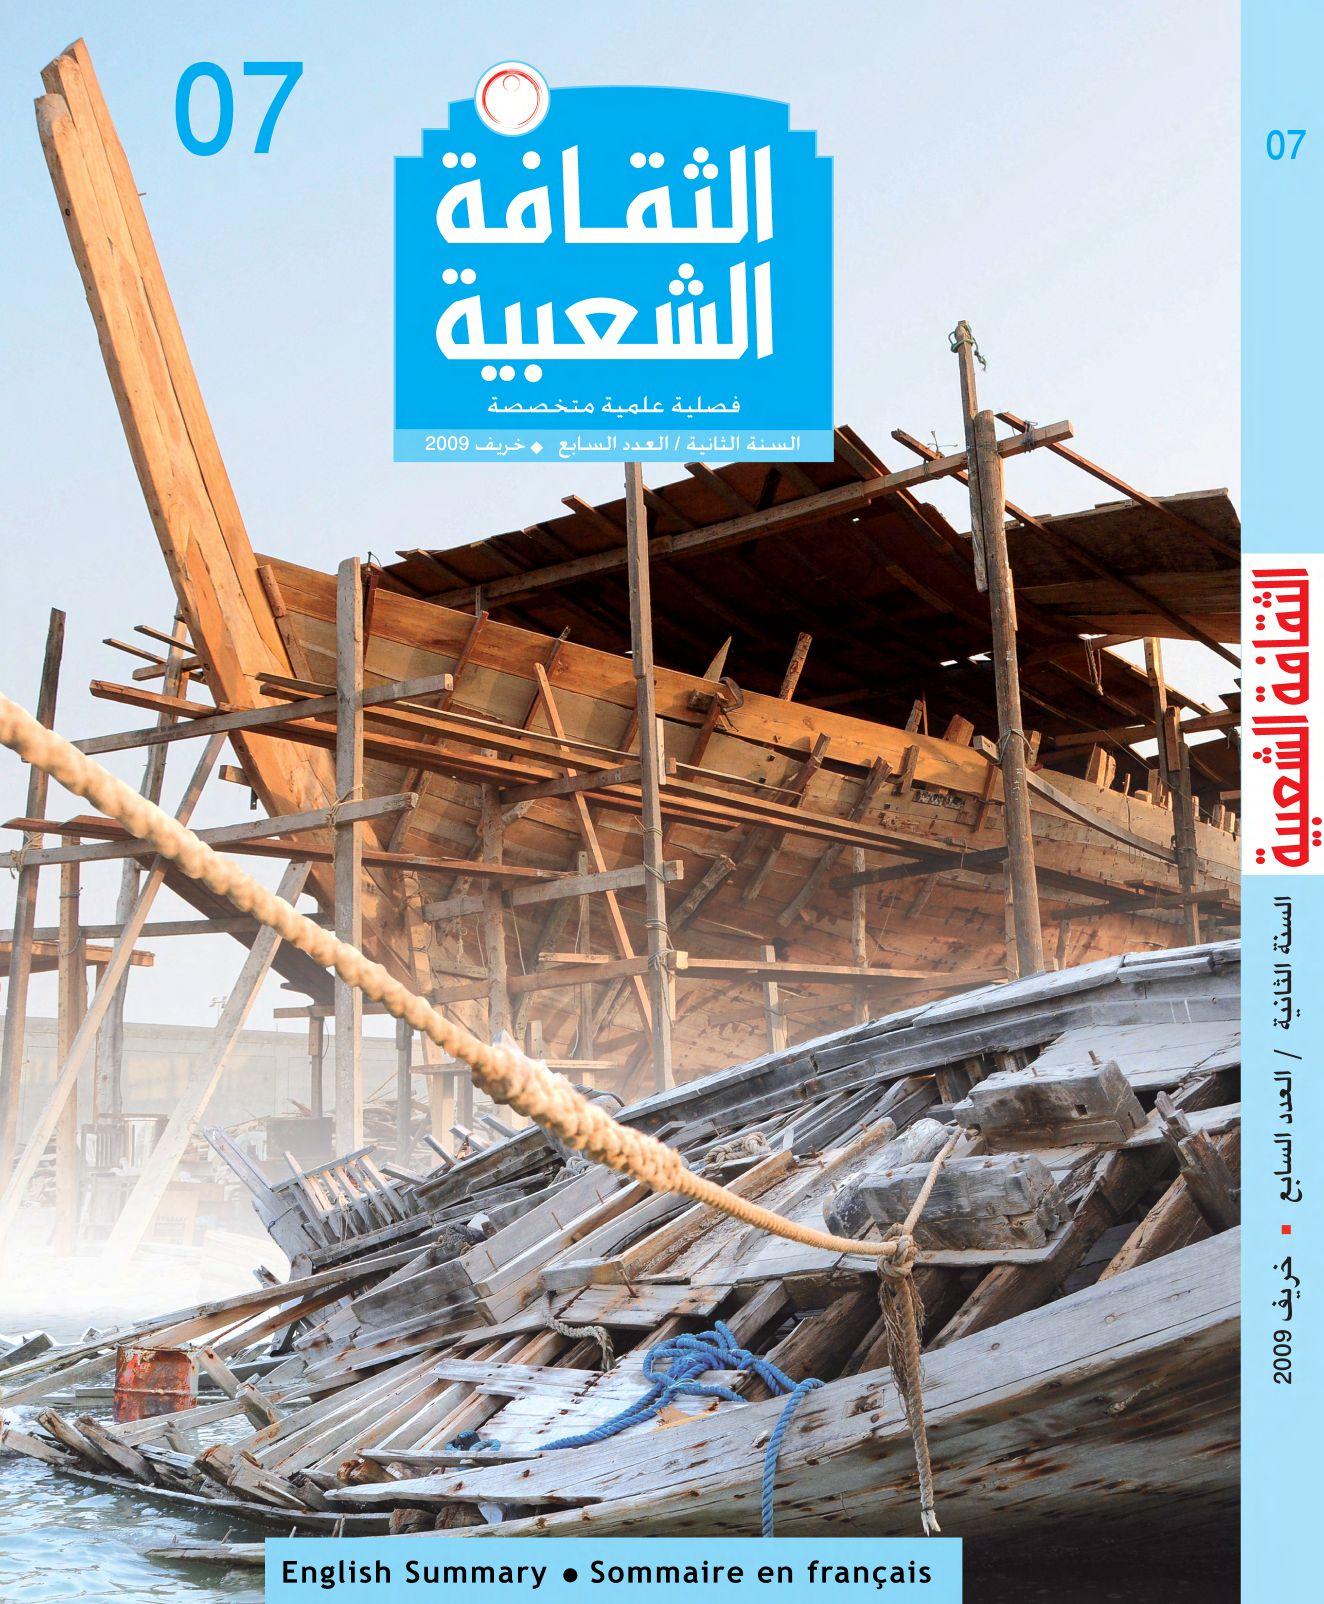 496797b2c Folk Culture Magazine from Bahrain by Hassan AlDoy - issuu